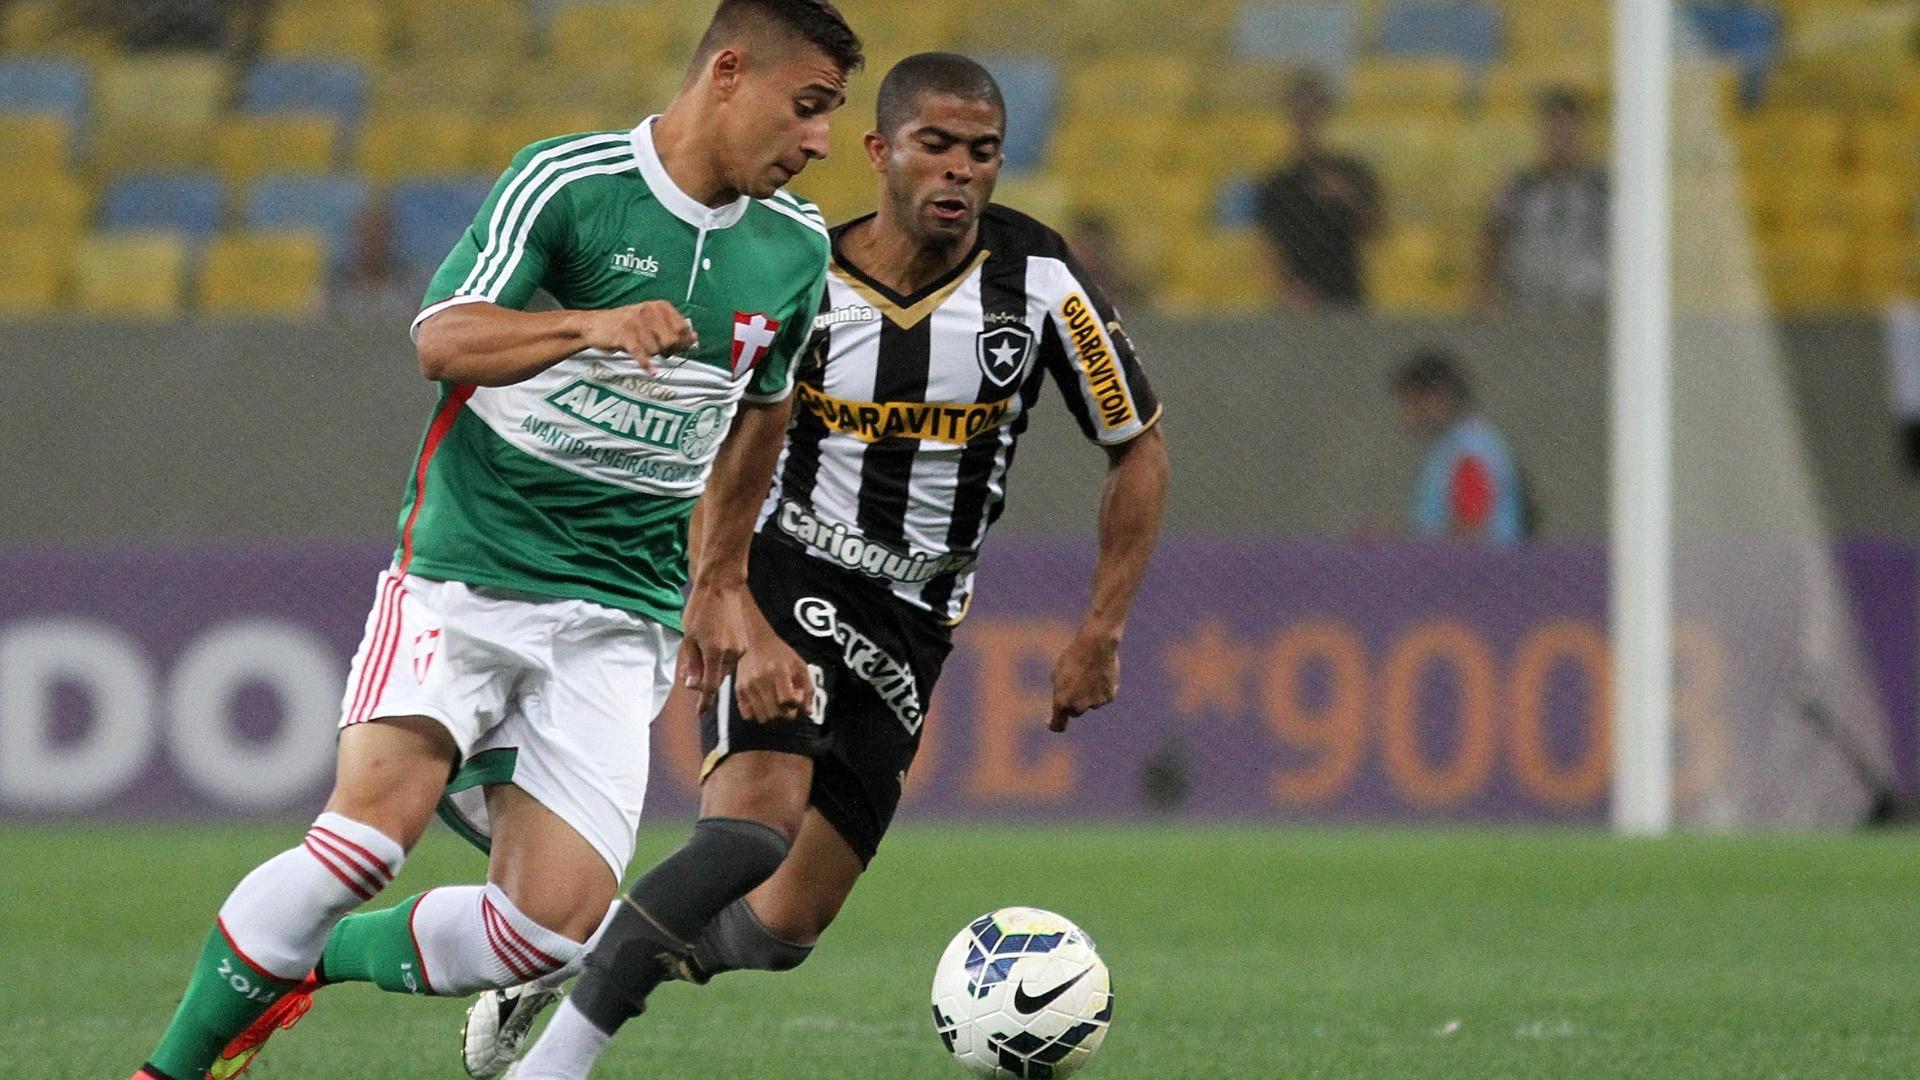 Junior Cesar tenta recuperar bola para o Botafogo contra o Palmeiras